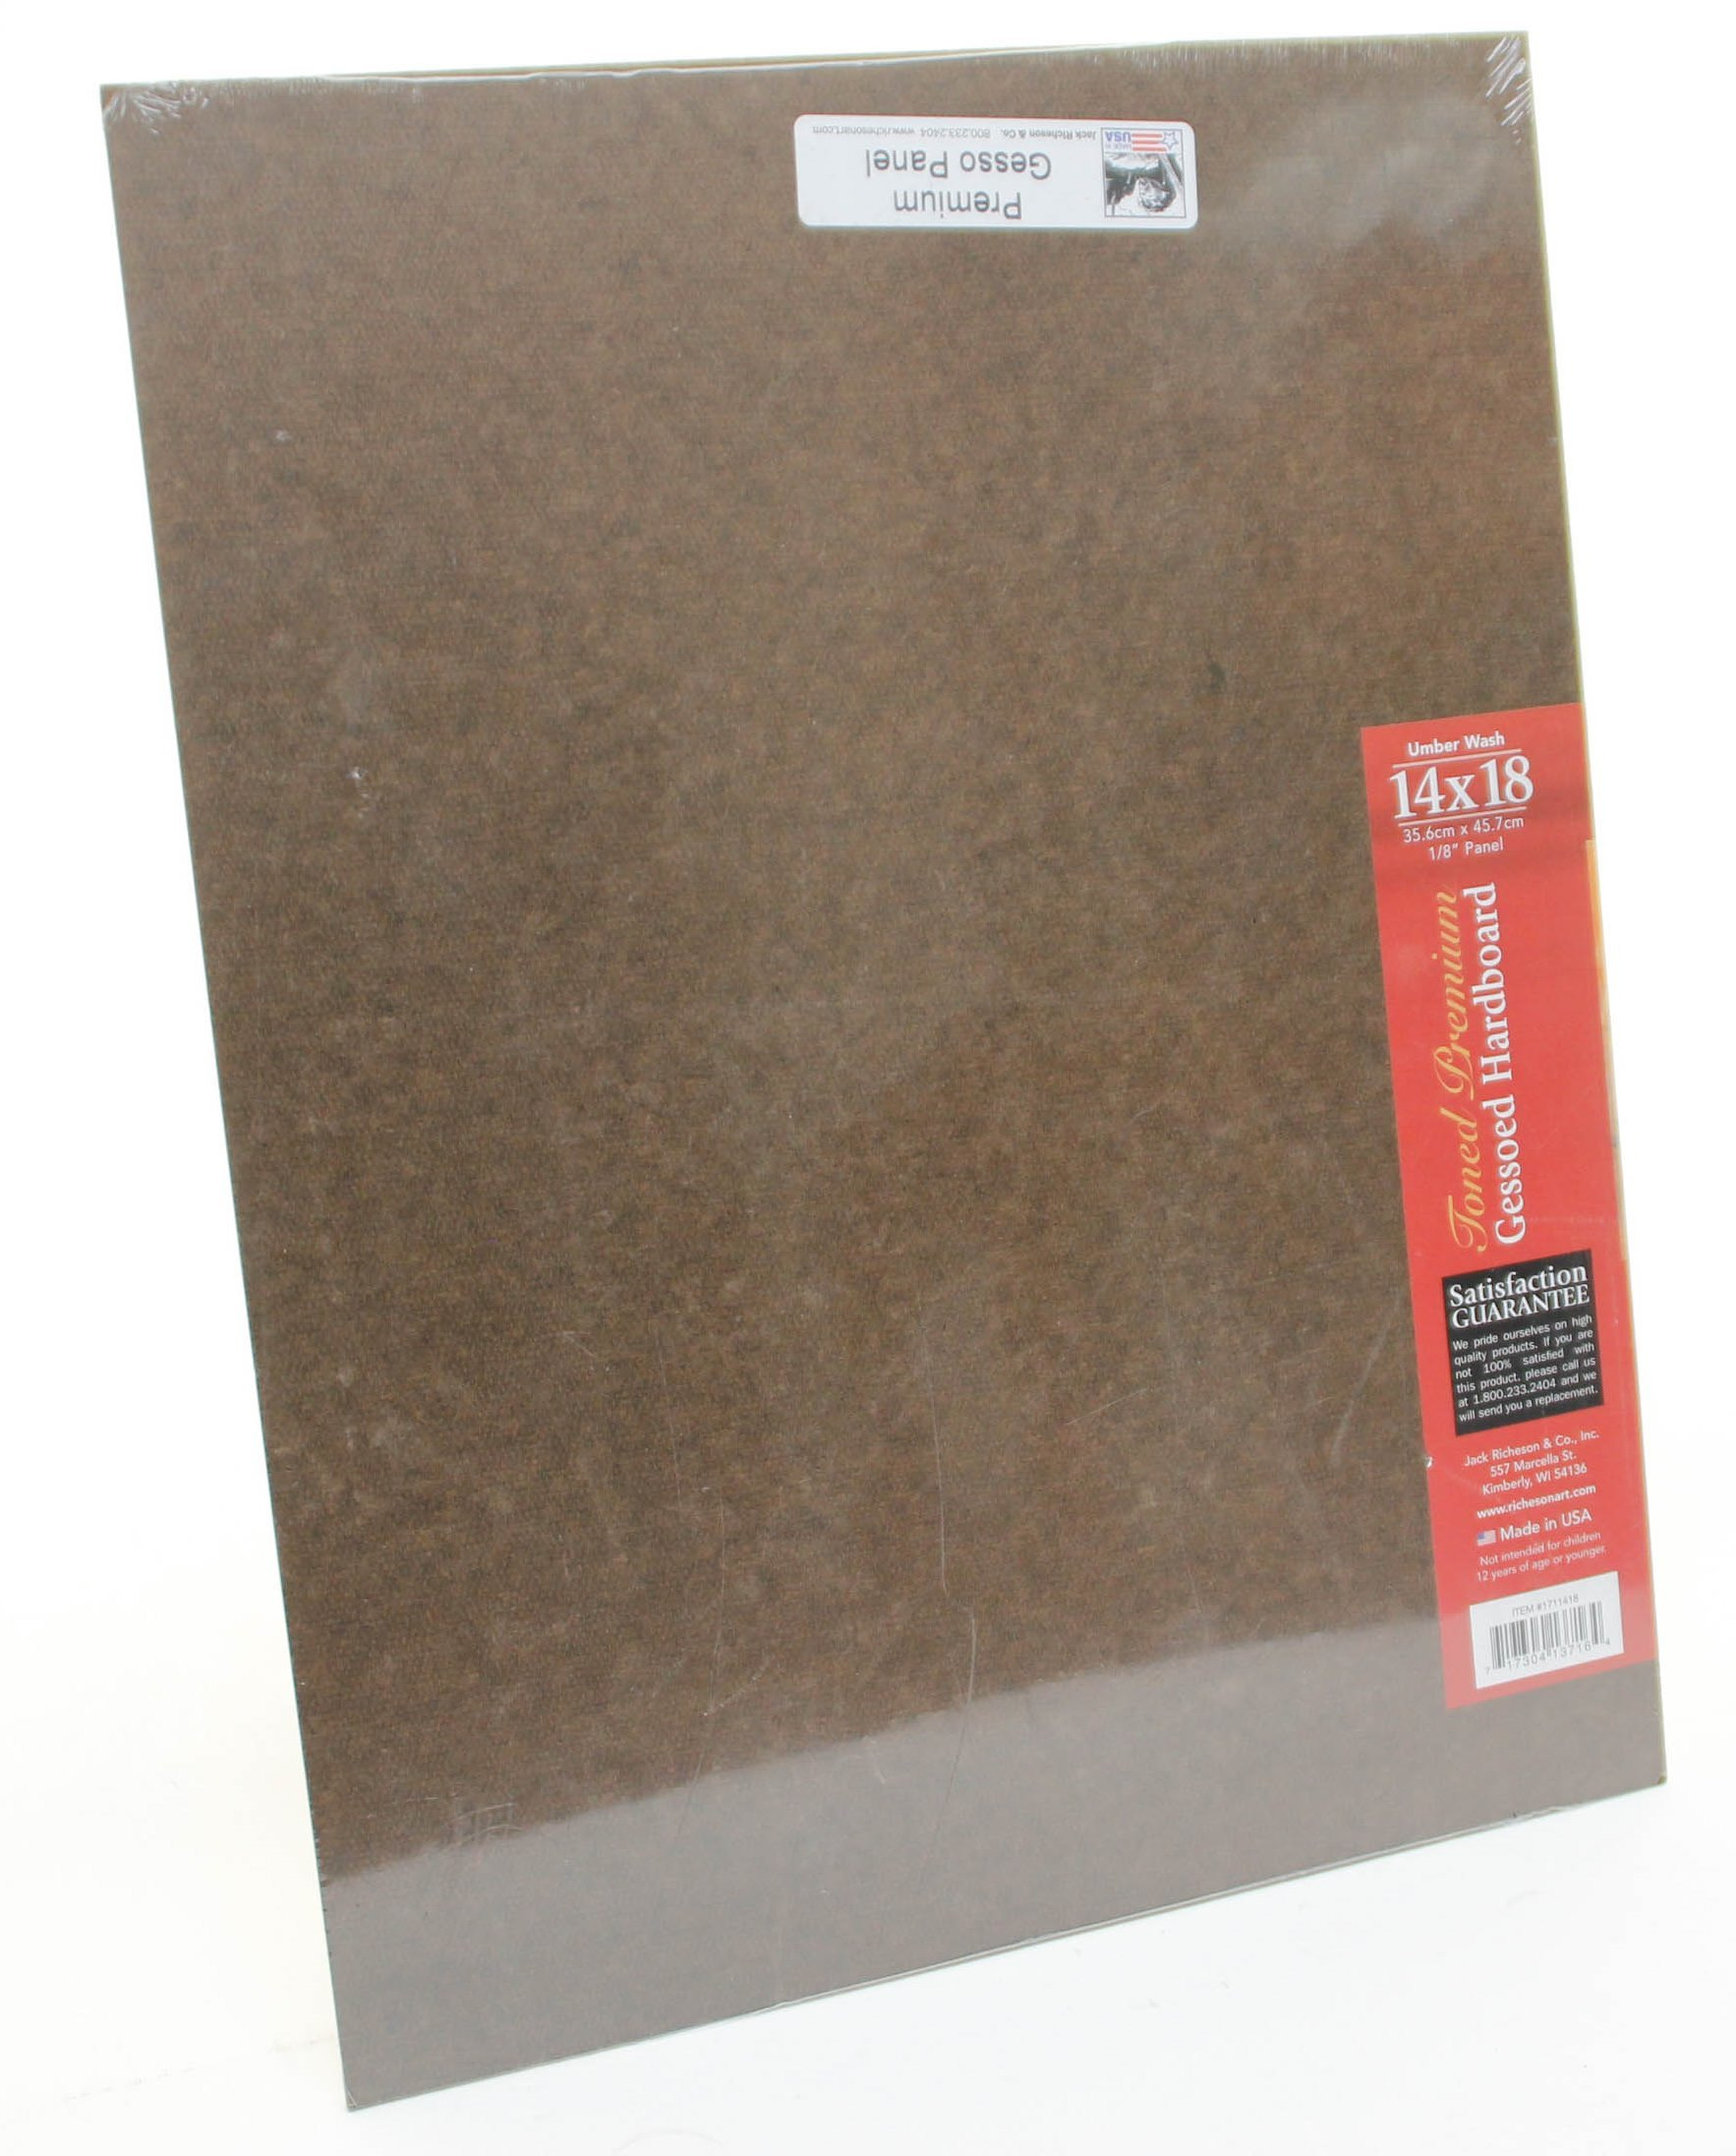 Jack Richeson Richeson Umber Wash Toned Gessoed 1//8 Hardboard 8x10